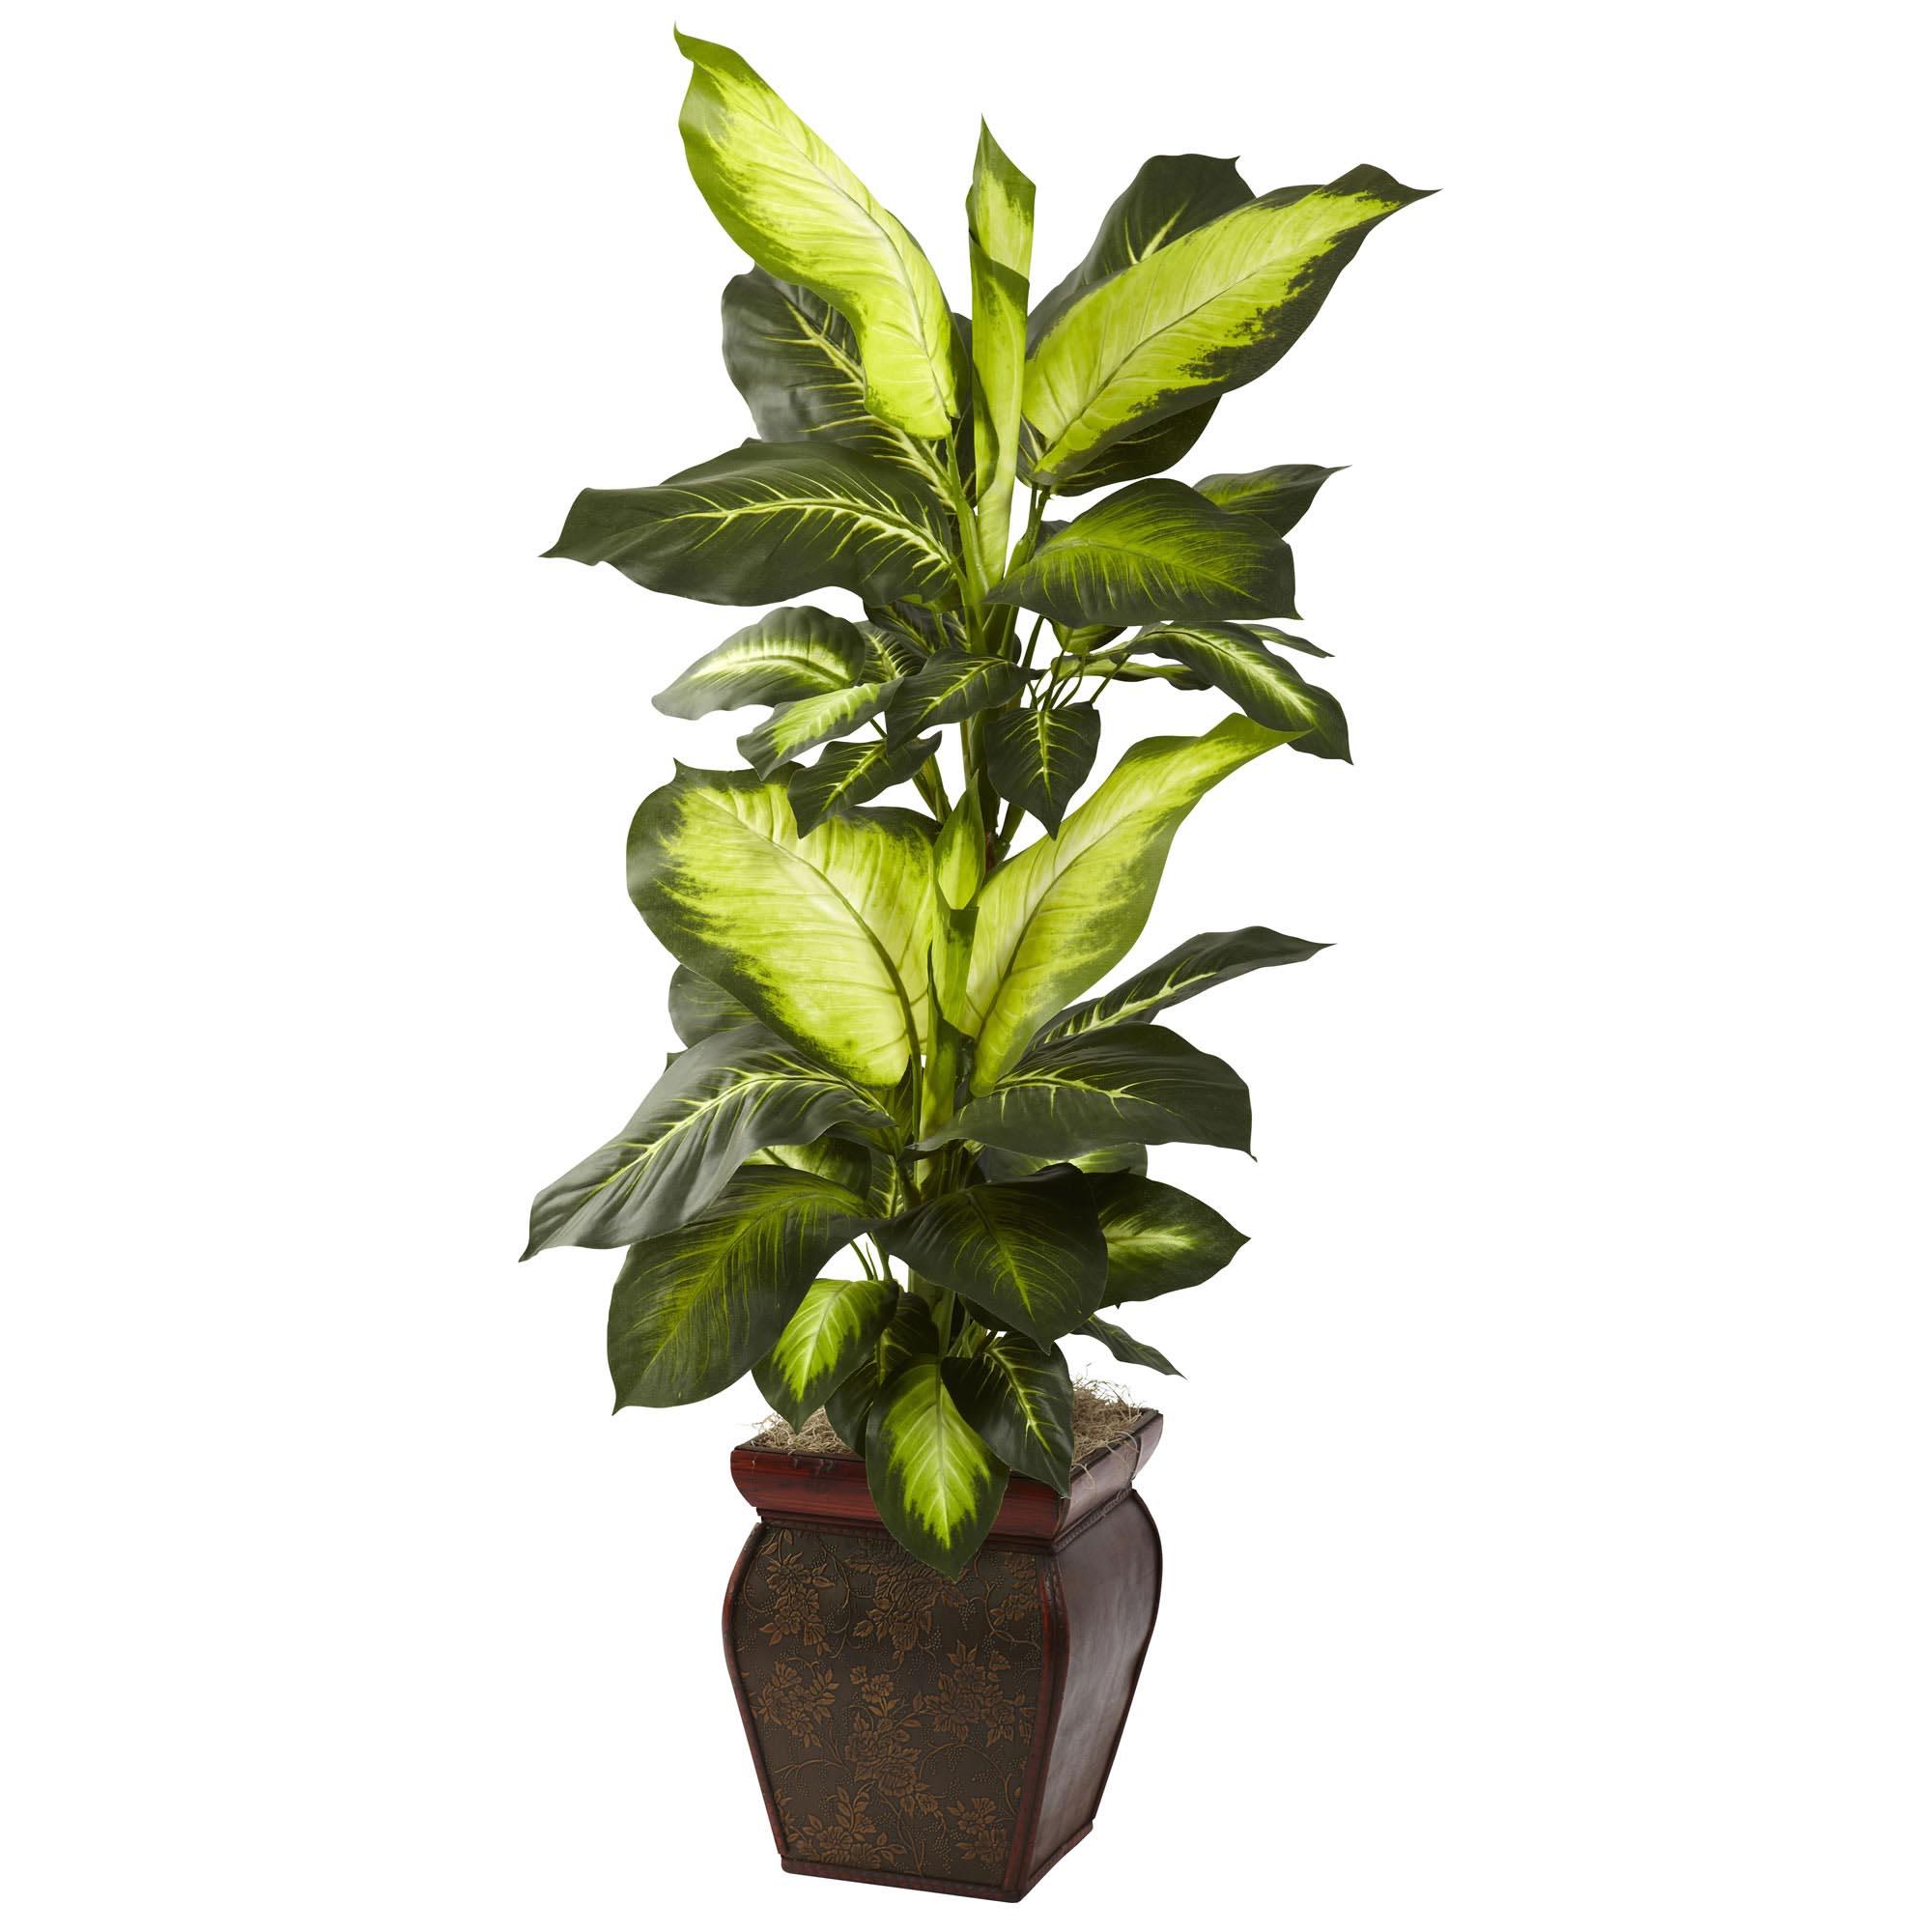 Artificial plants for kitchen - 45 Inch Silk Golden Dieffenbachia In Decorative Planter